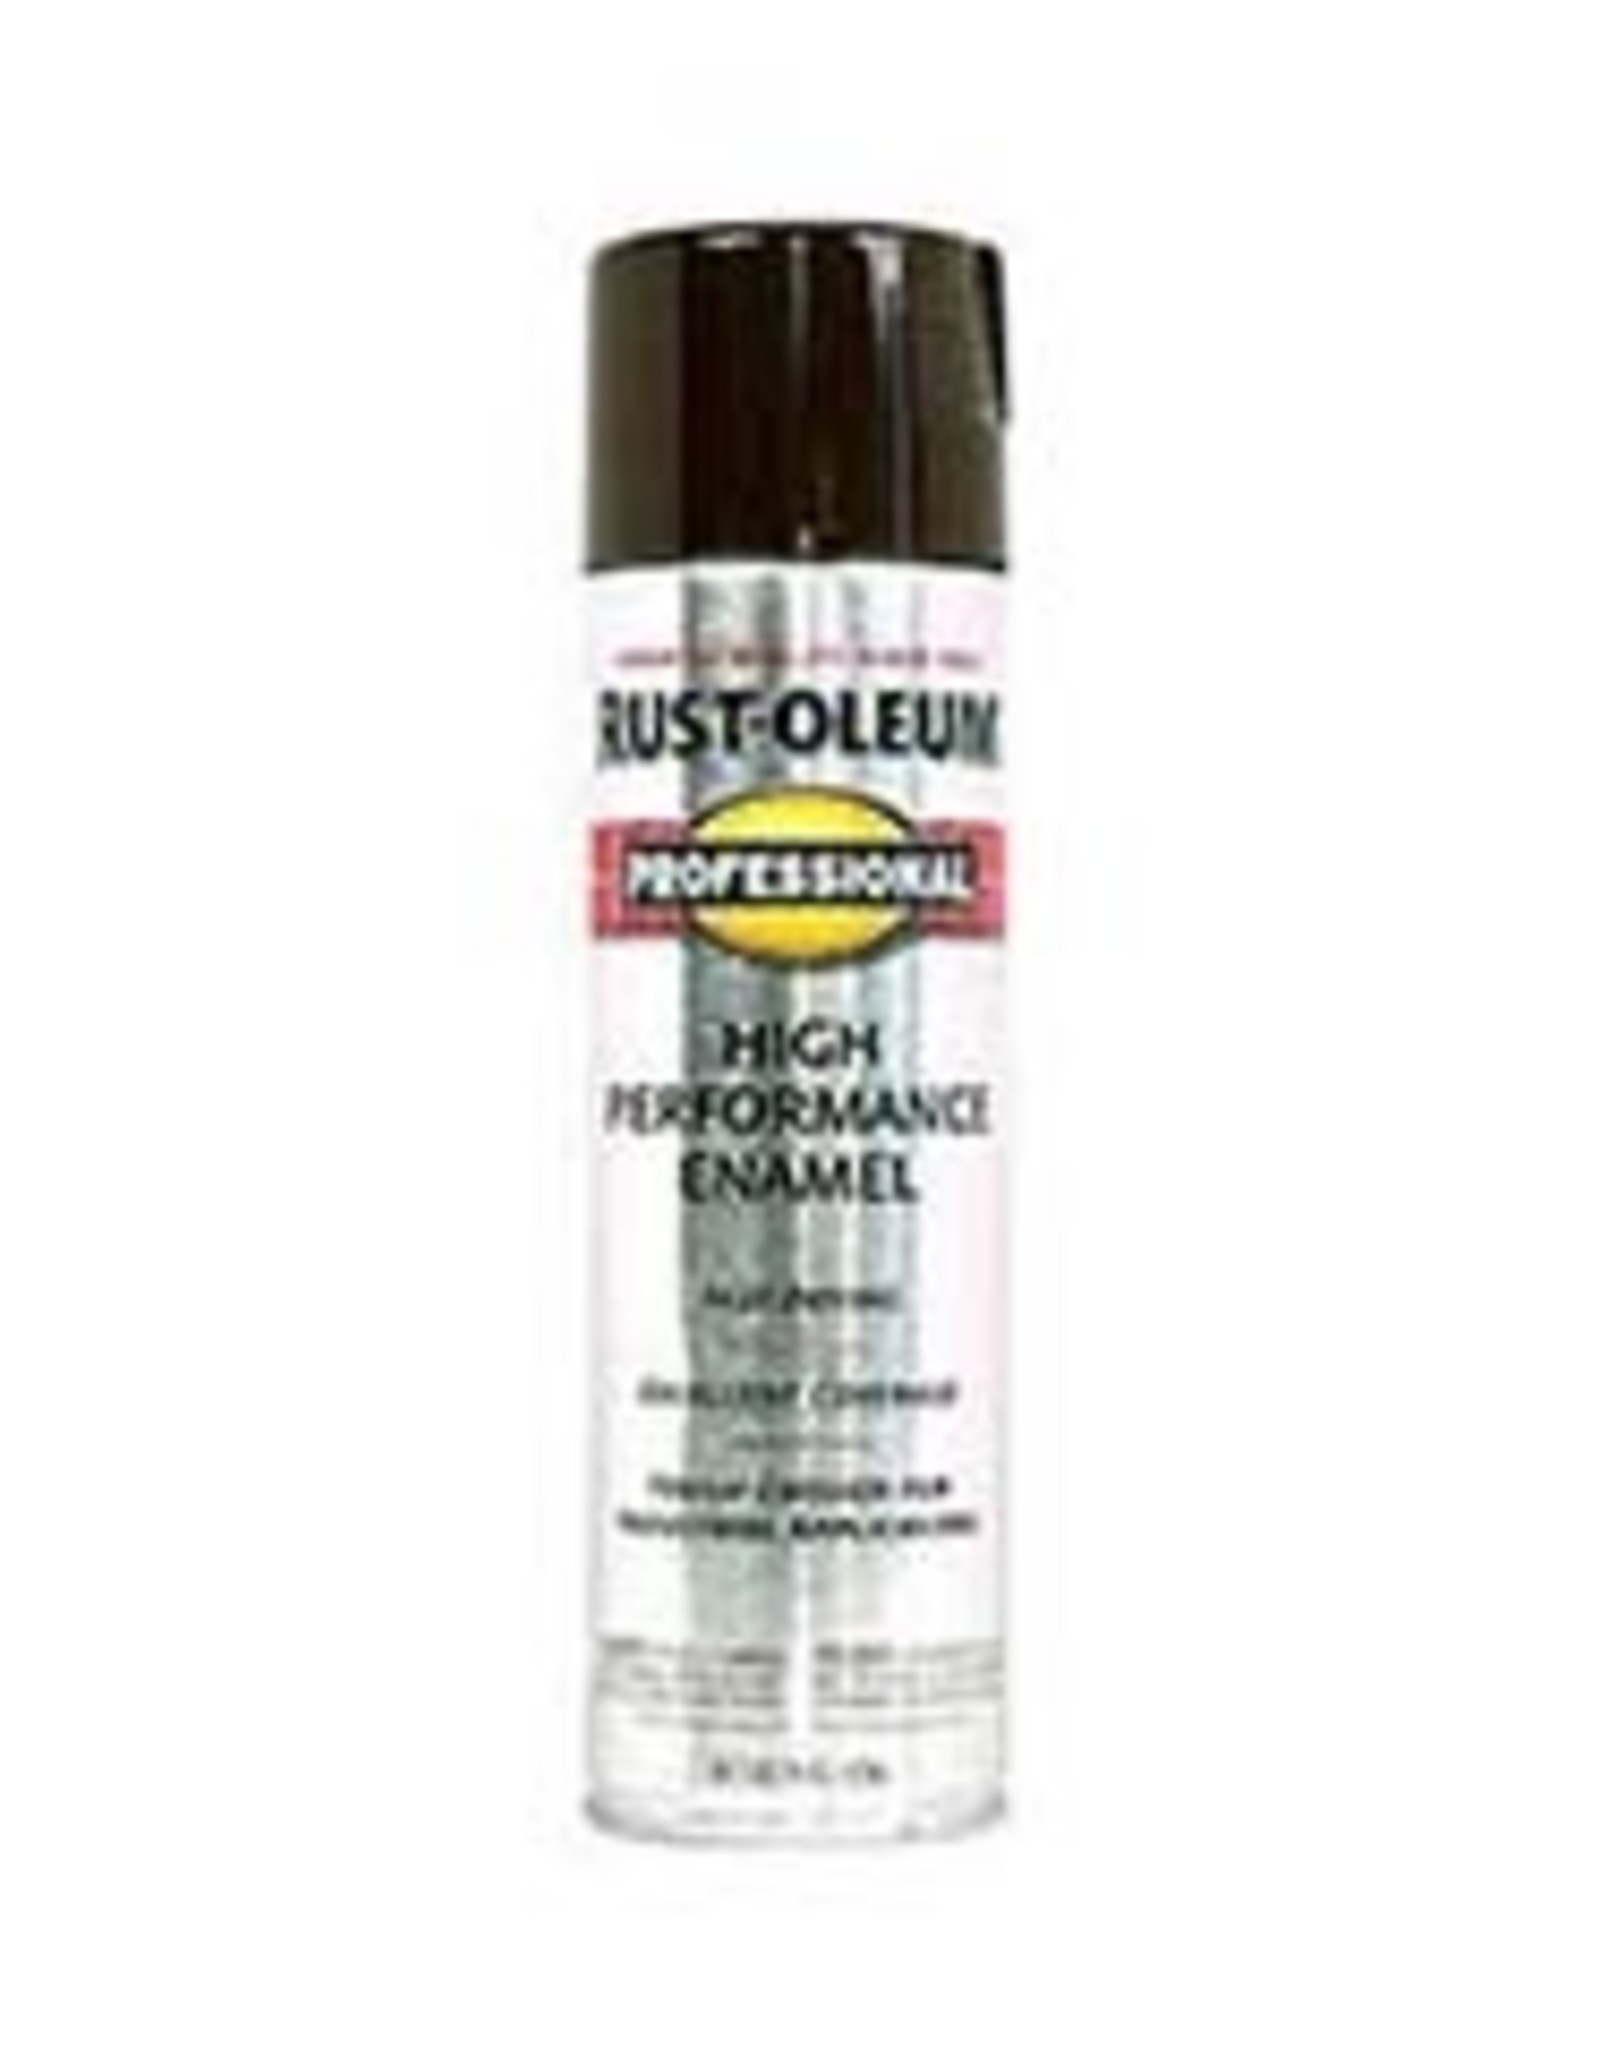 Rust-Oleum Rust-Oleum 7548 15 oz Professional Spray Paint Dark Brown